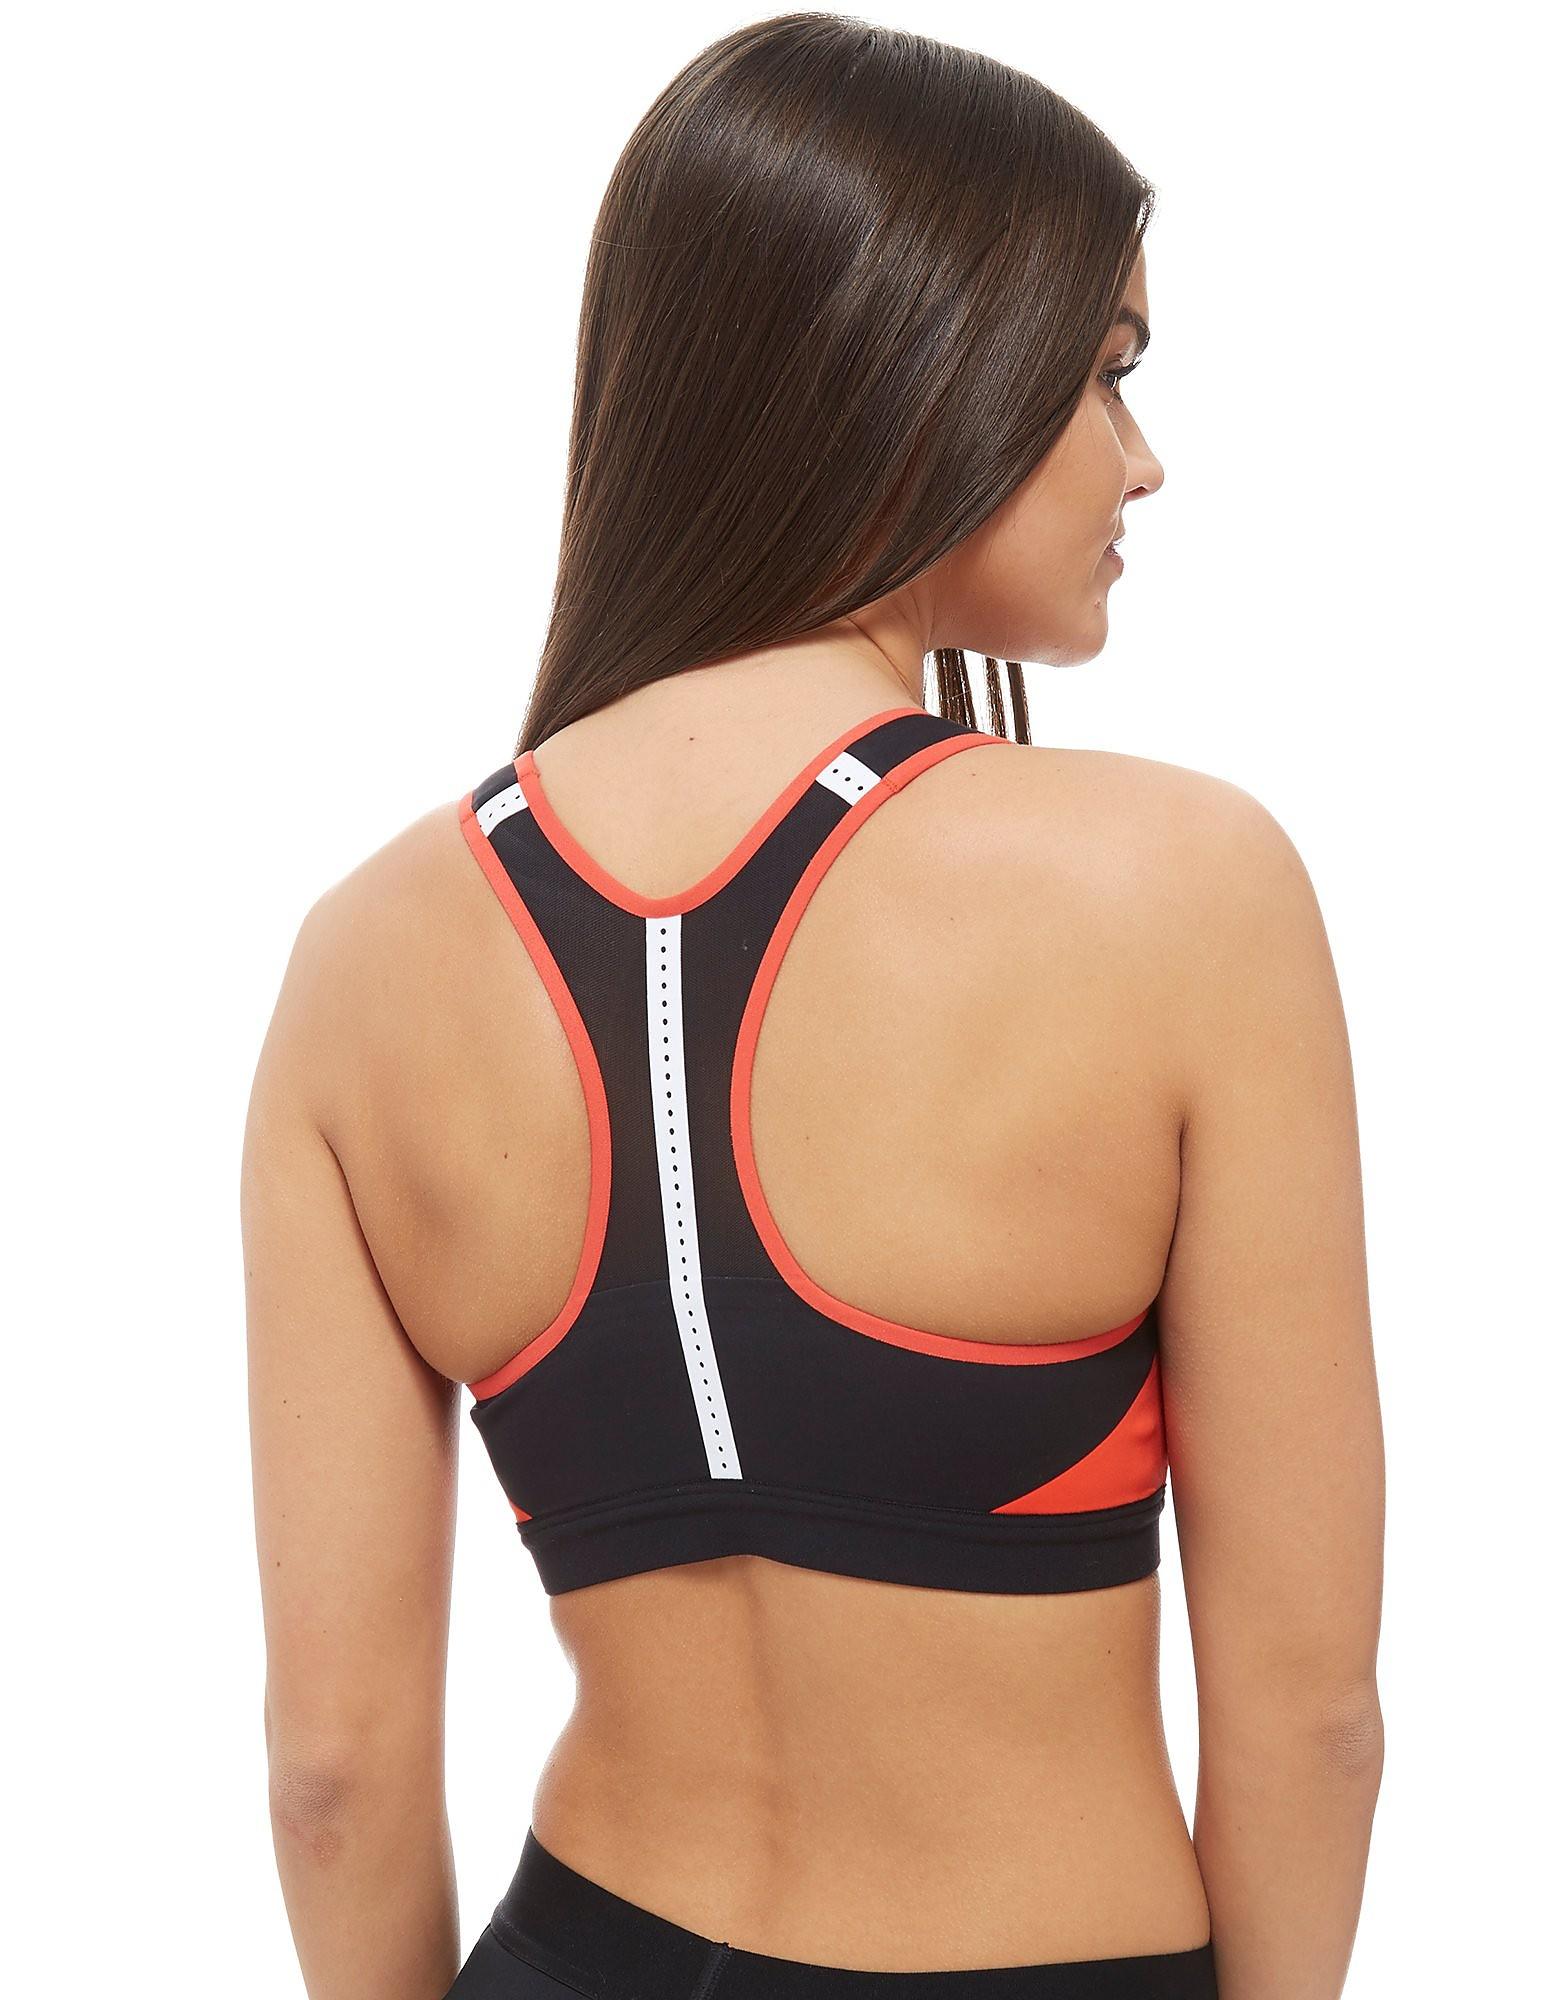 Nike Motion Adapt Sports Bra